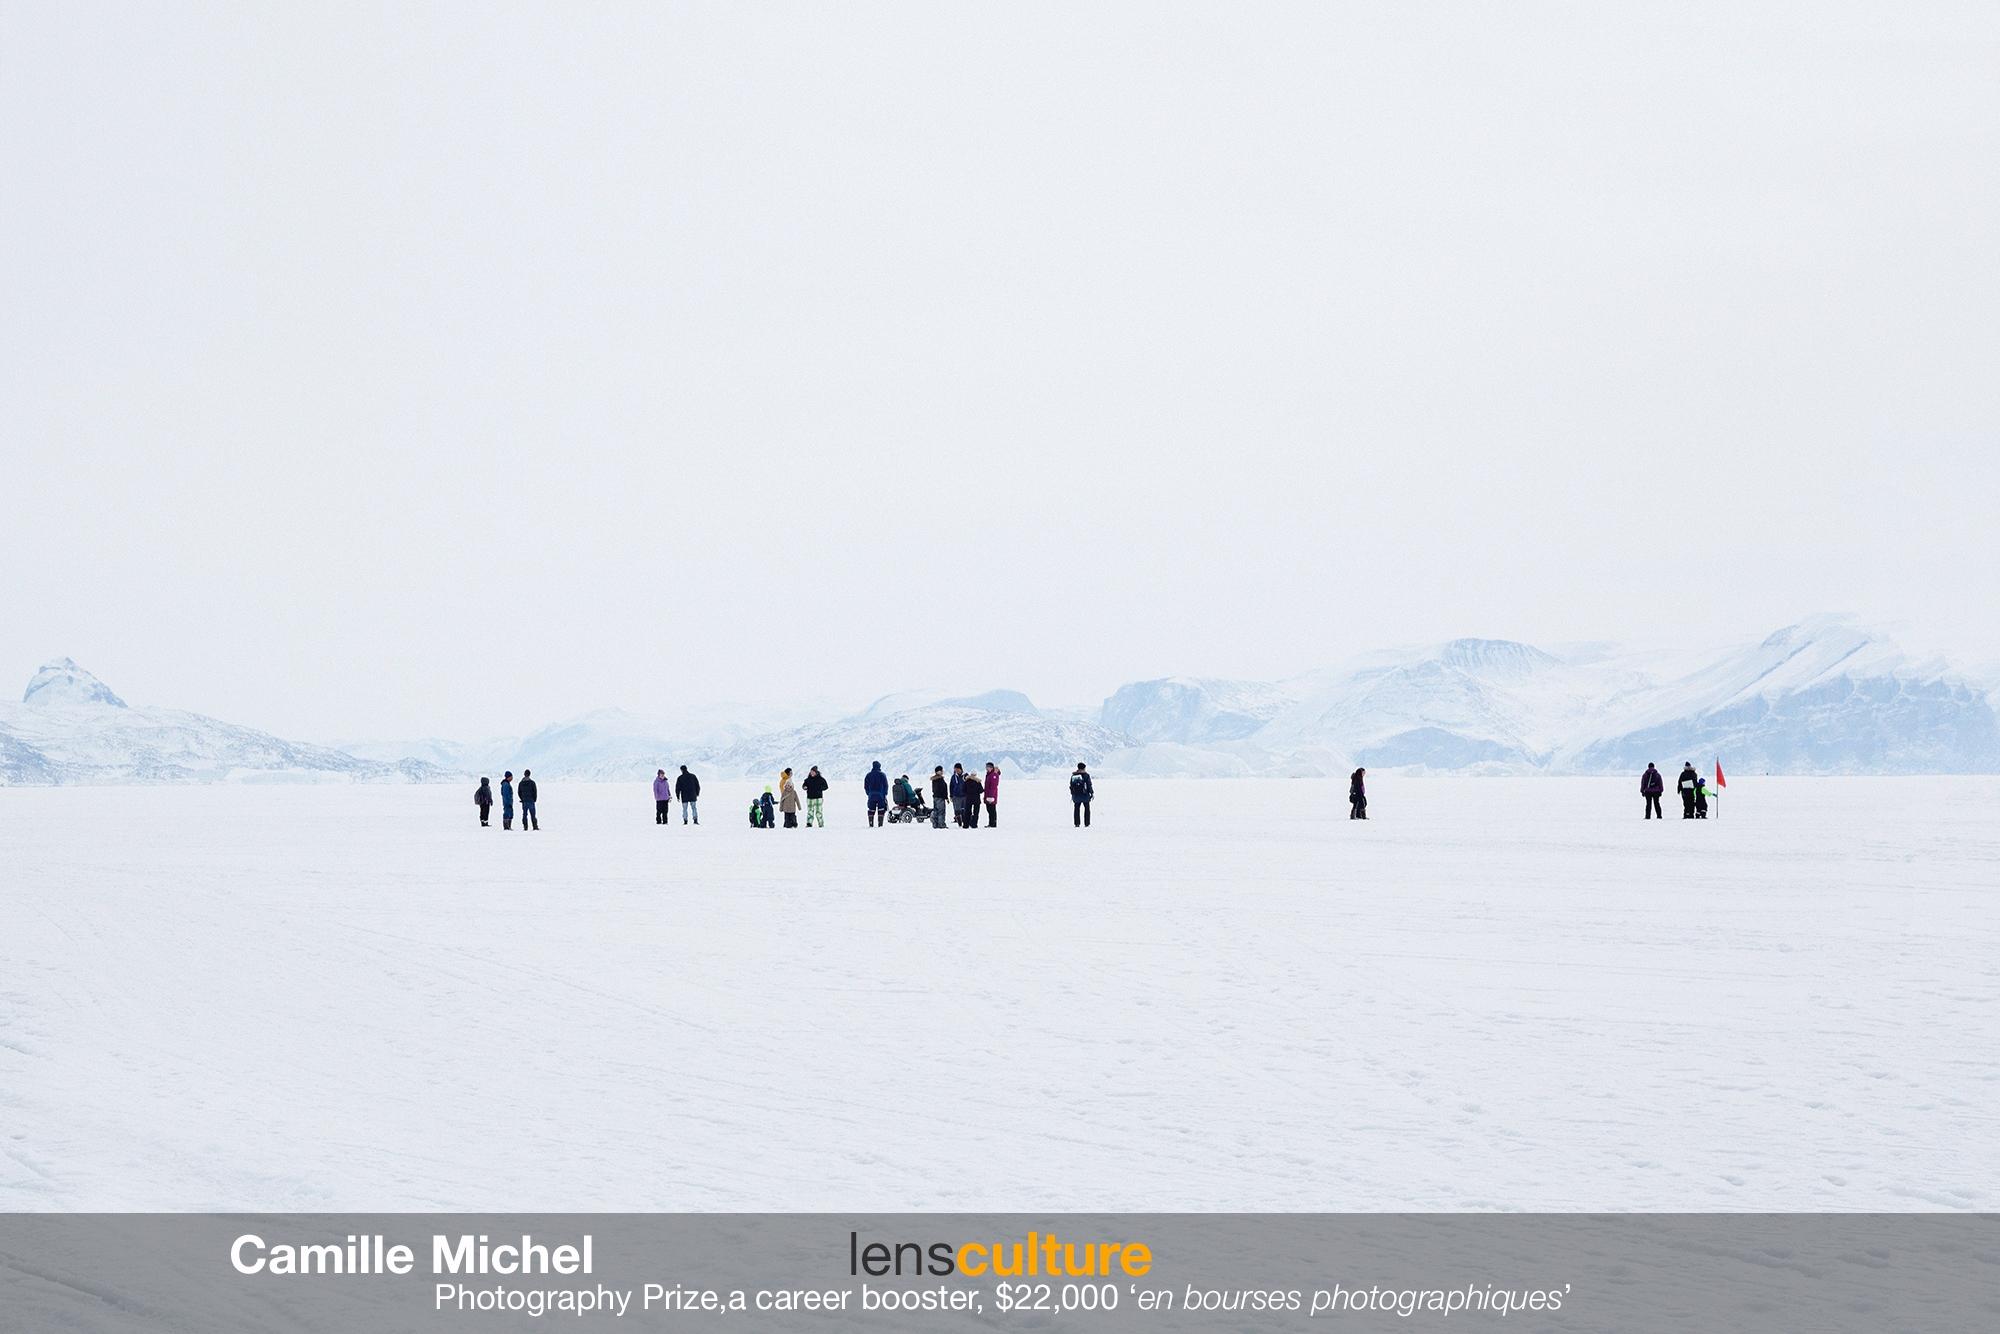 Photographers, boost career Len - velvetandpurple | ello